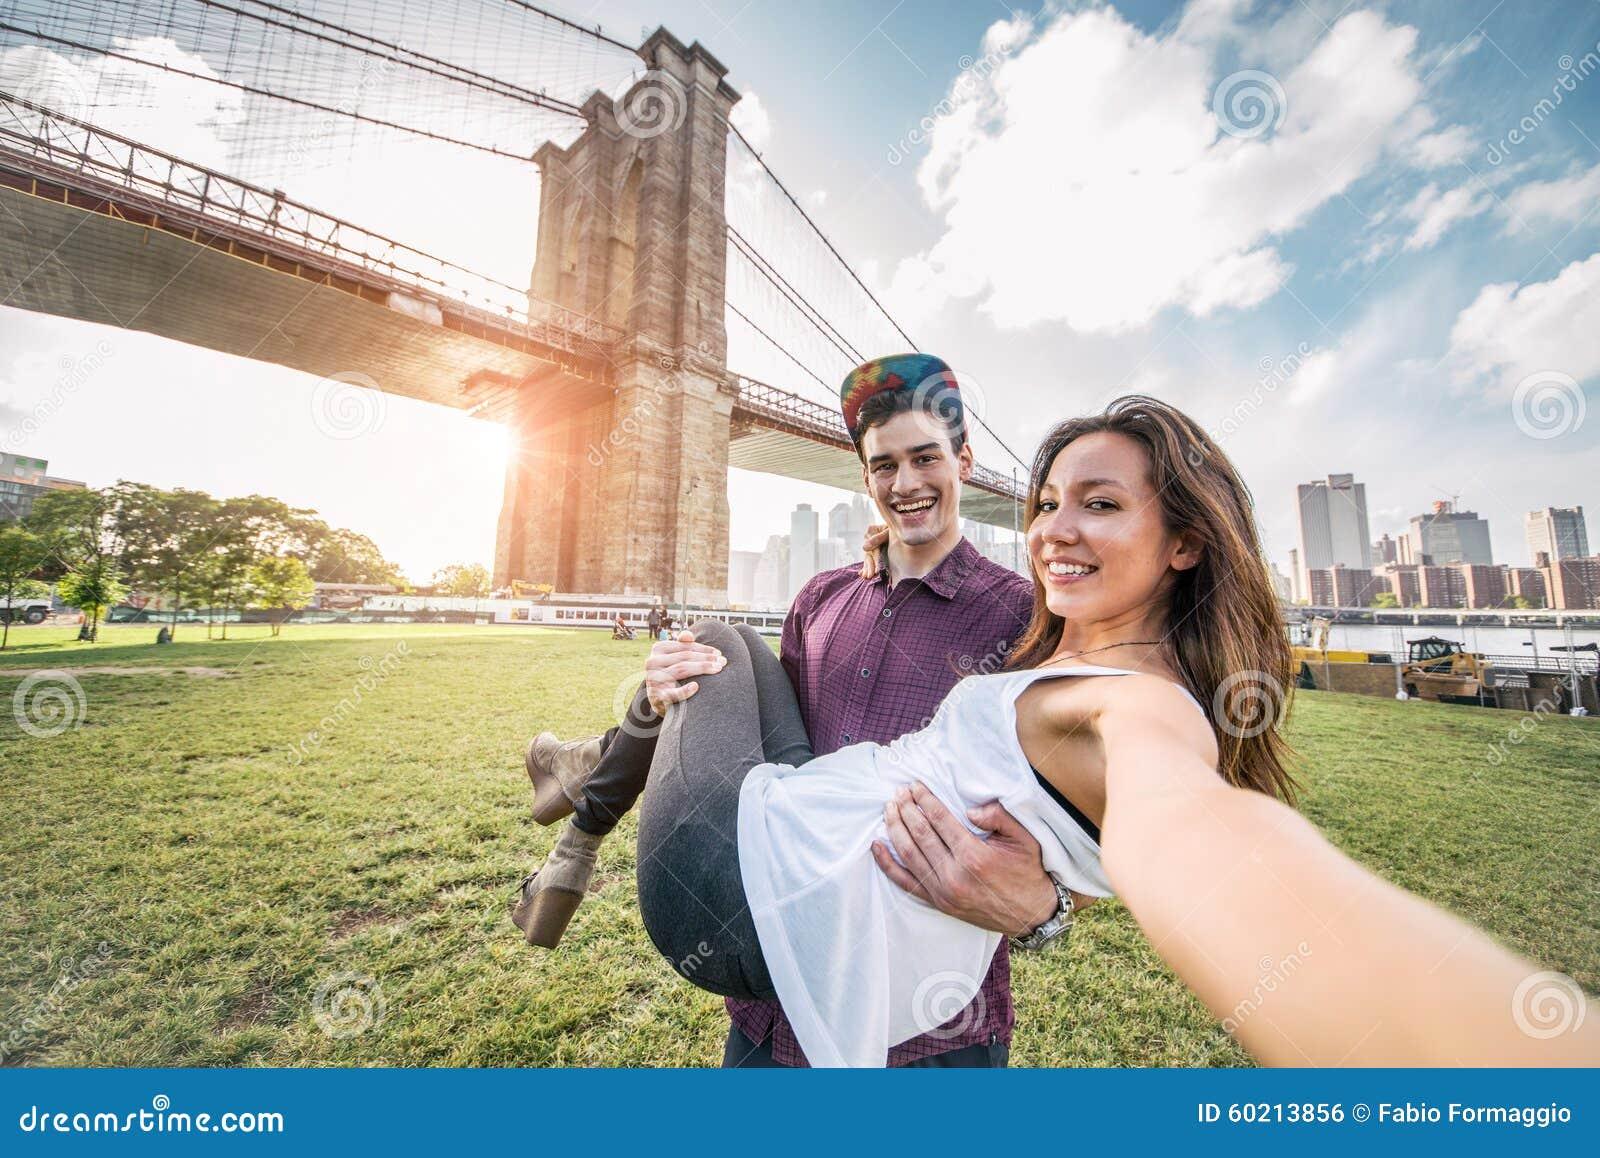 Reddit dating a mormon guy from california